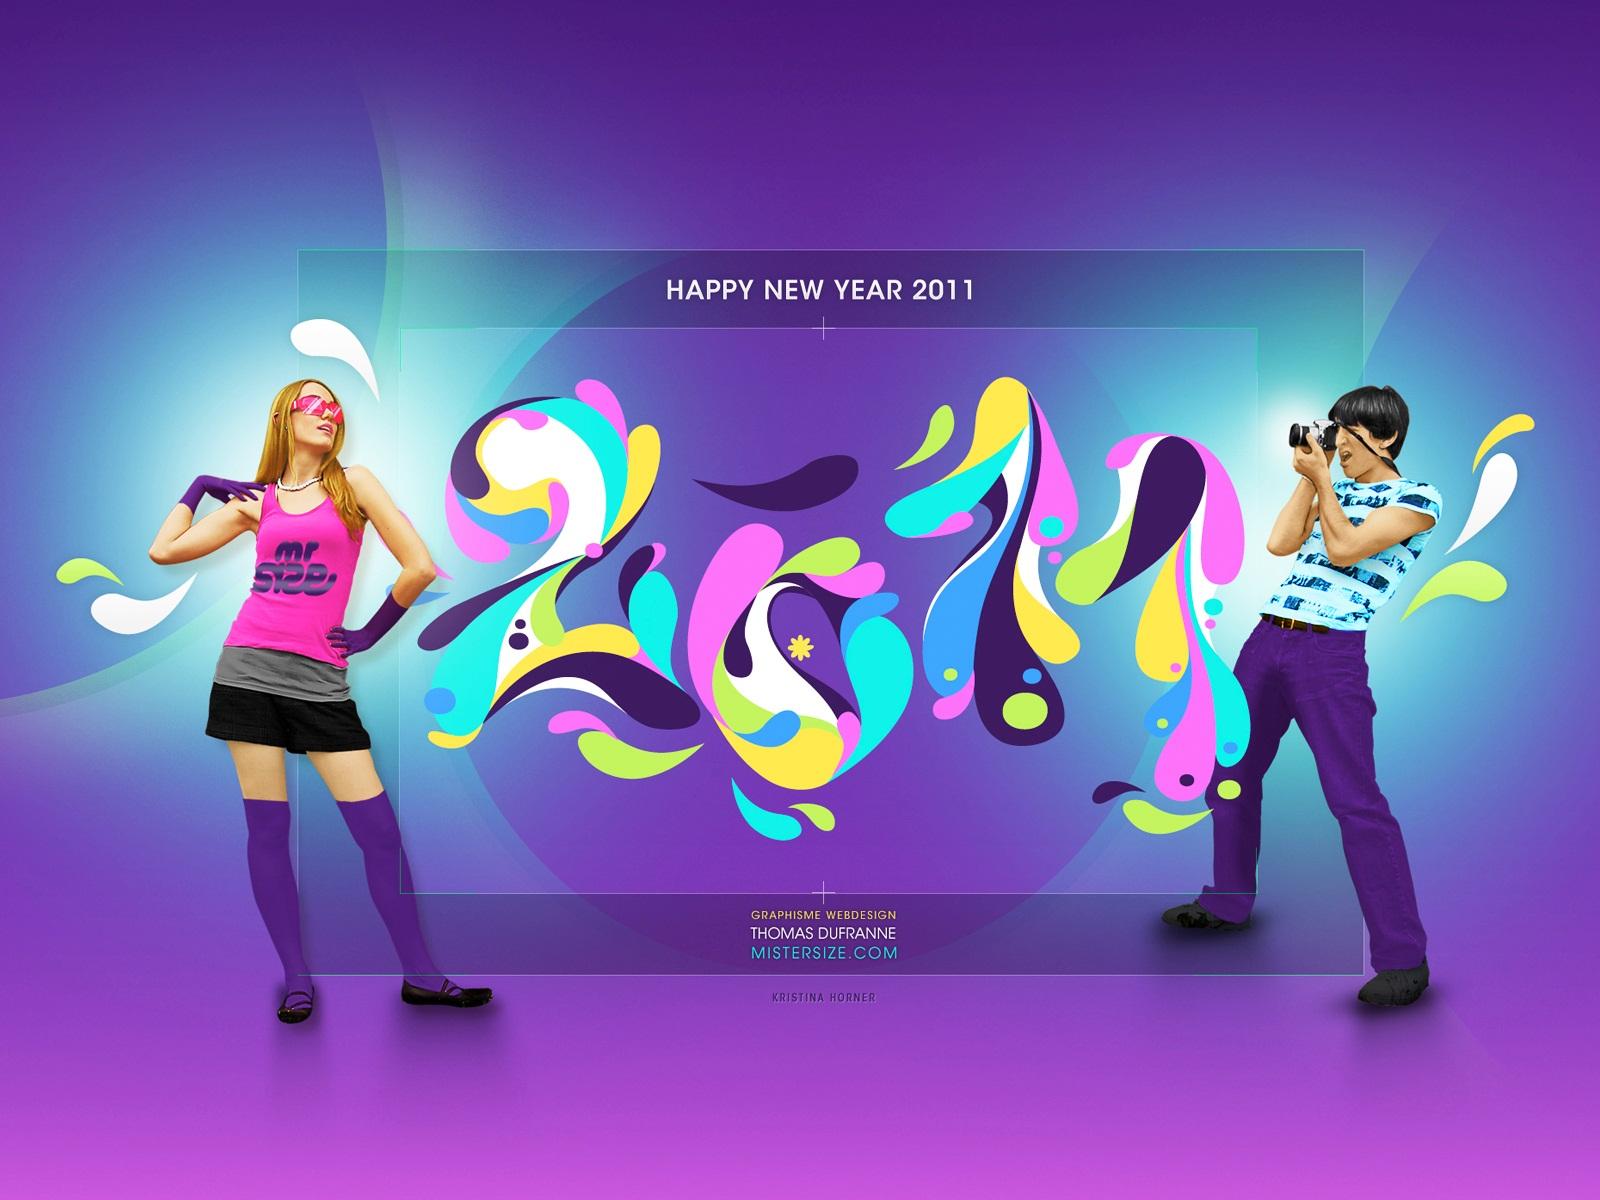 Happy New Year 2011 HD